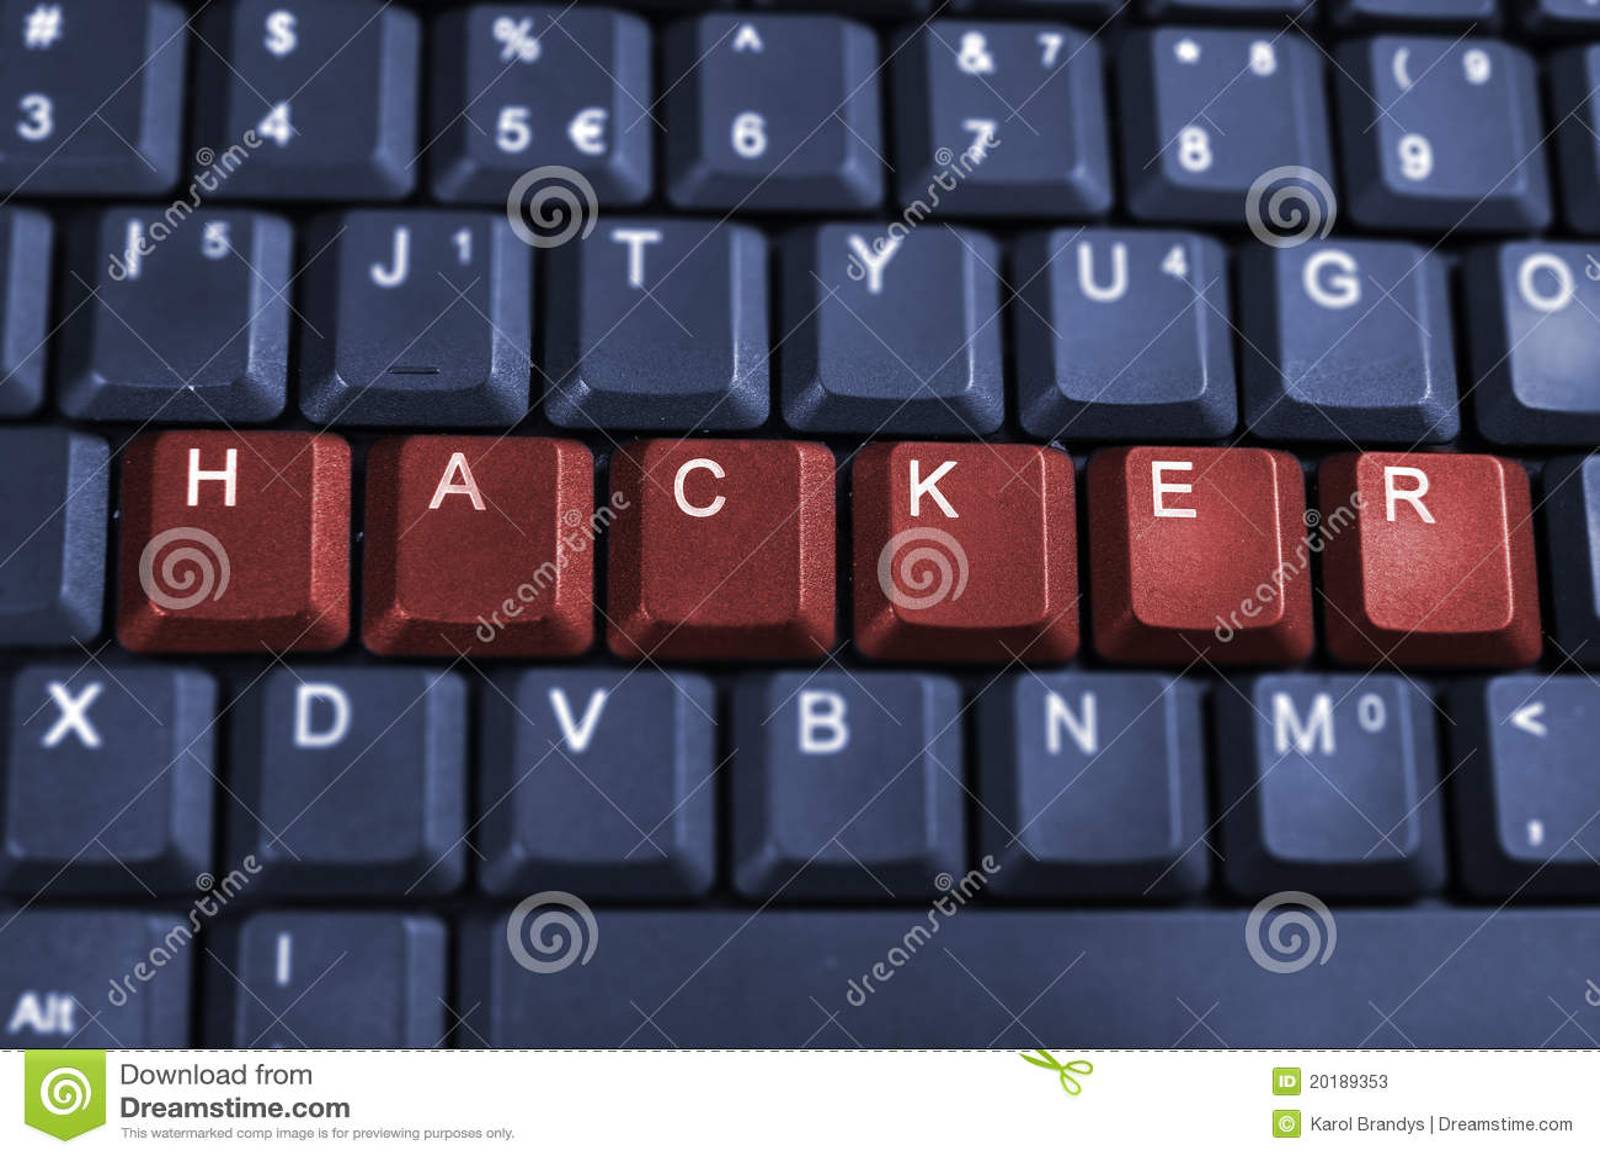 Web Hacking Security